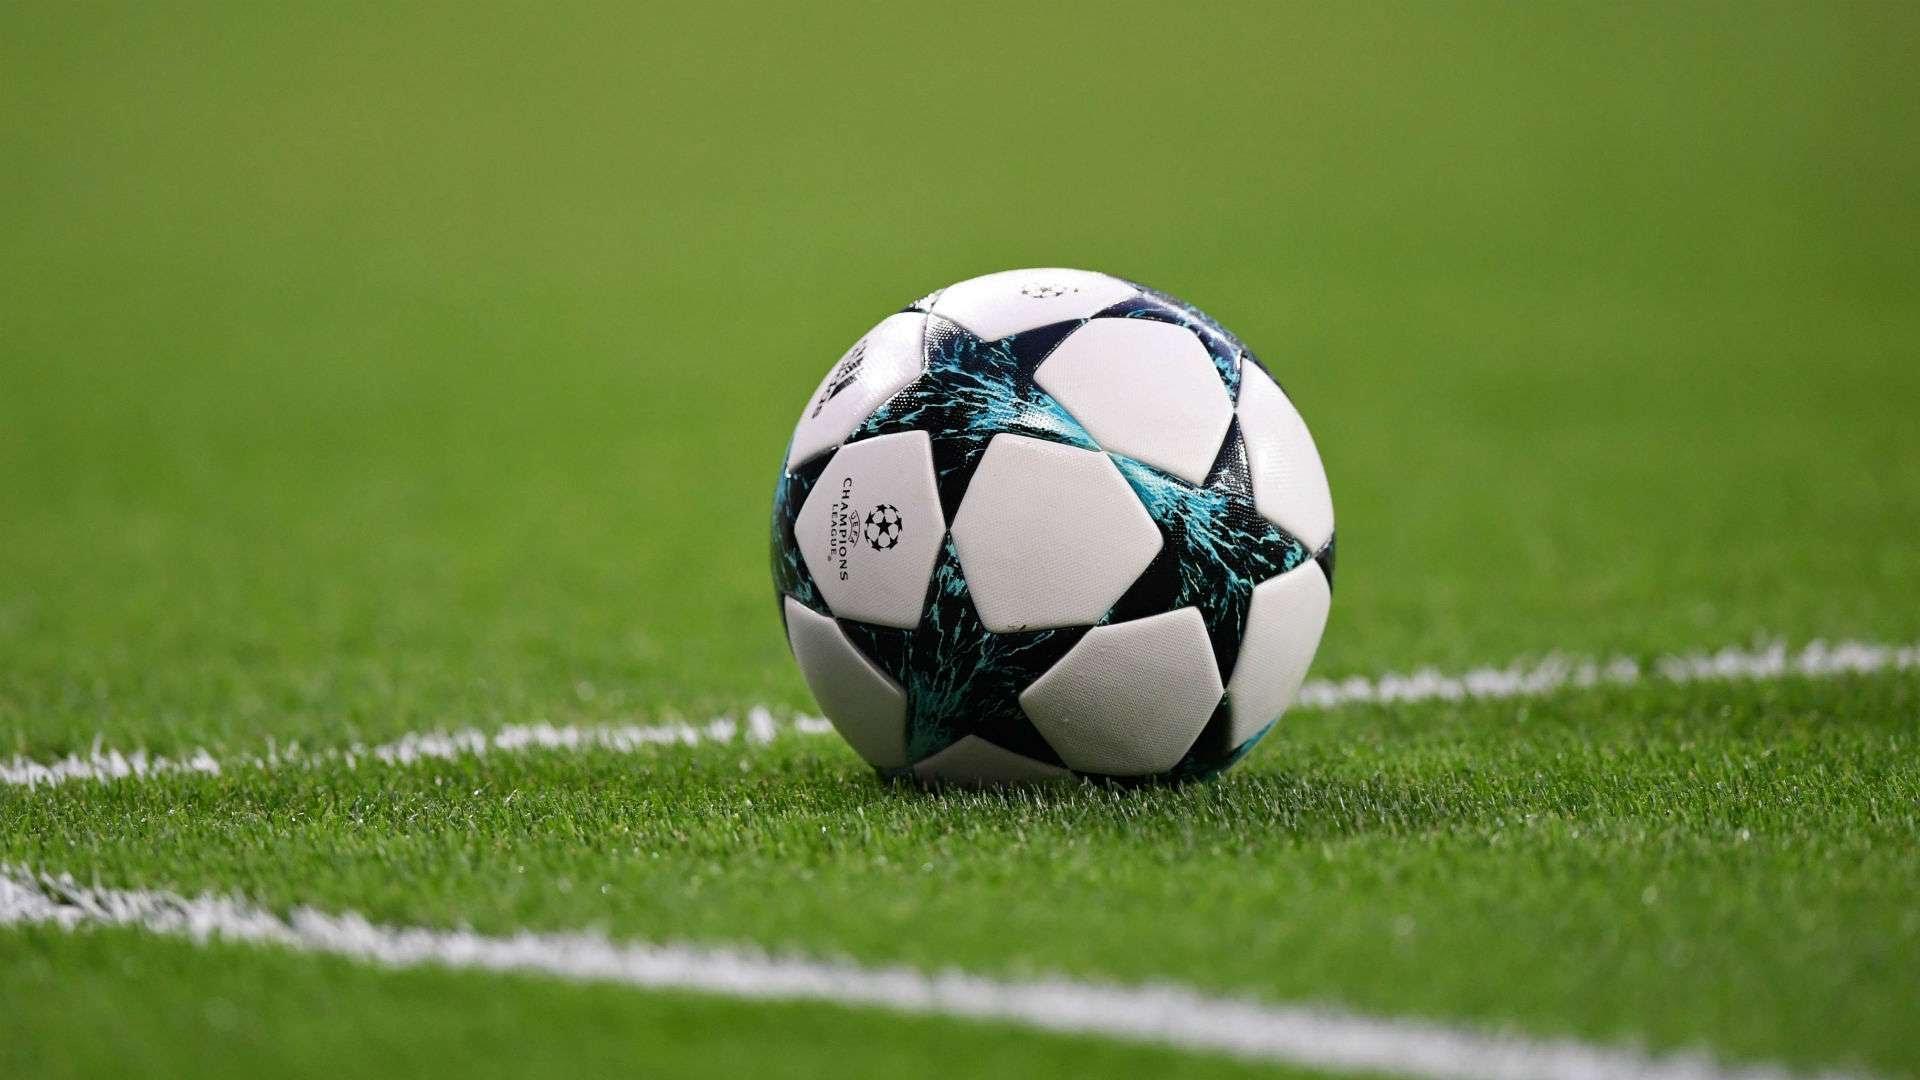 Champions League 2017-18 ball Adidas finale